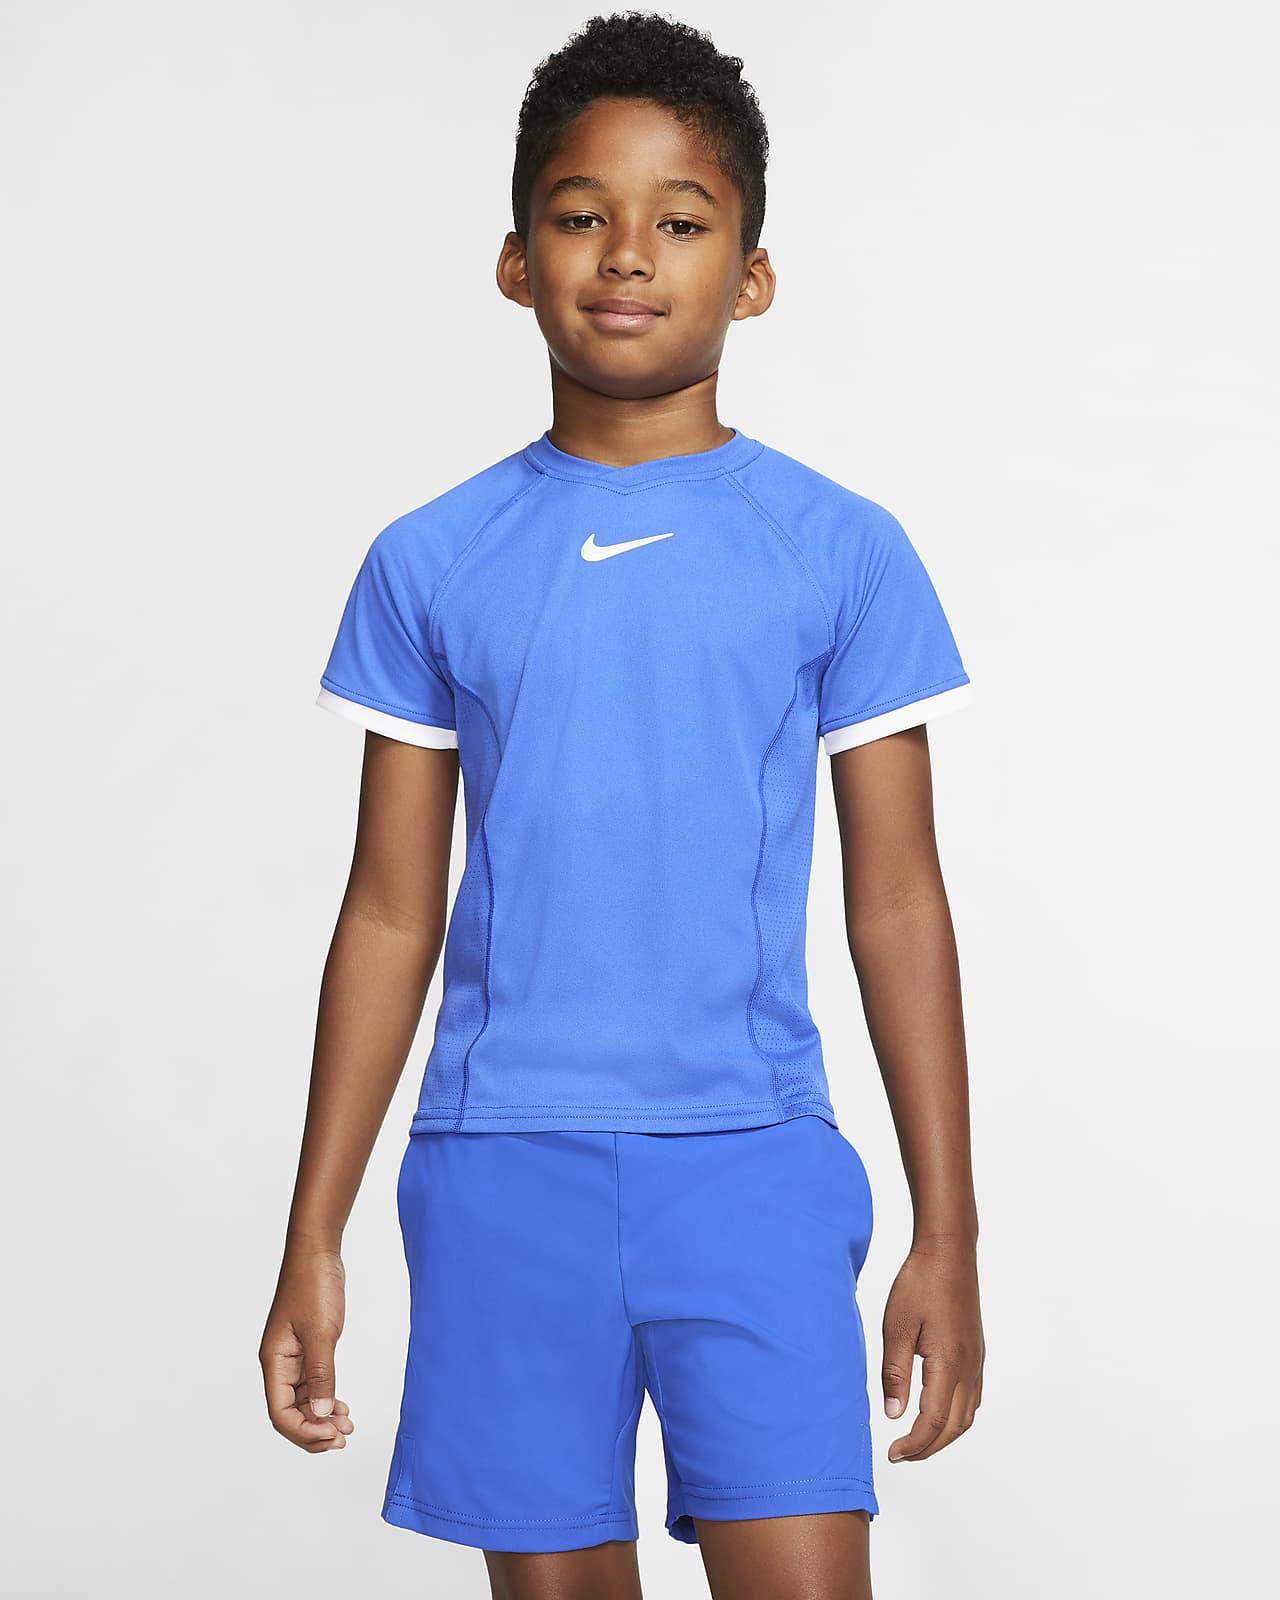 NikeCourt Dri-FIT Older Kids (Boys') Short-Sleeve Tennis Top